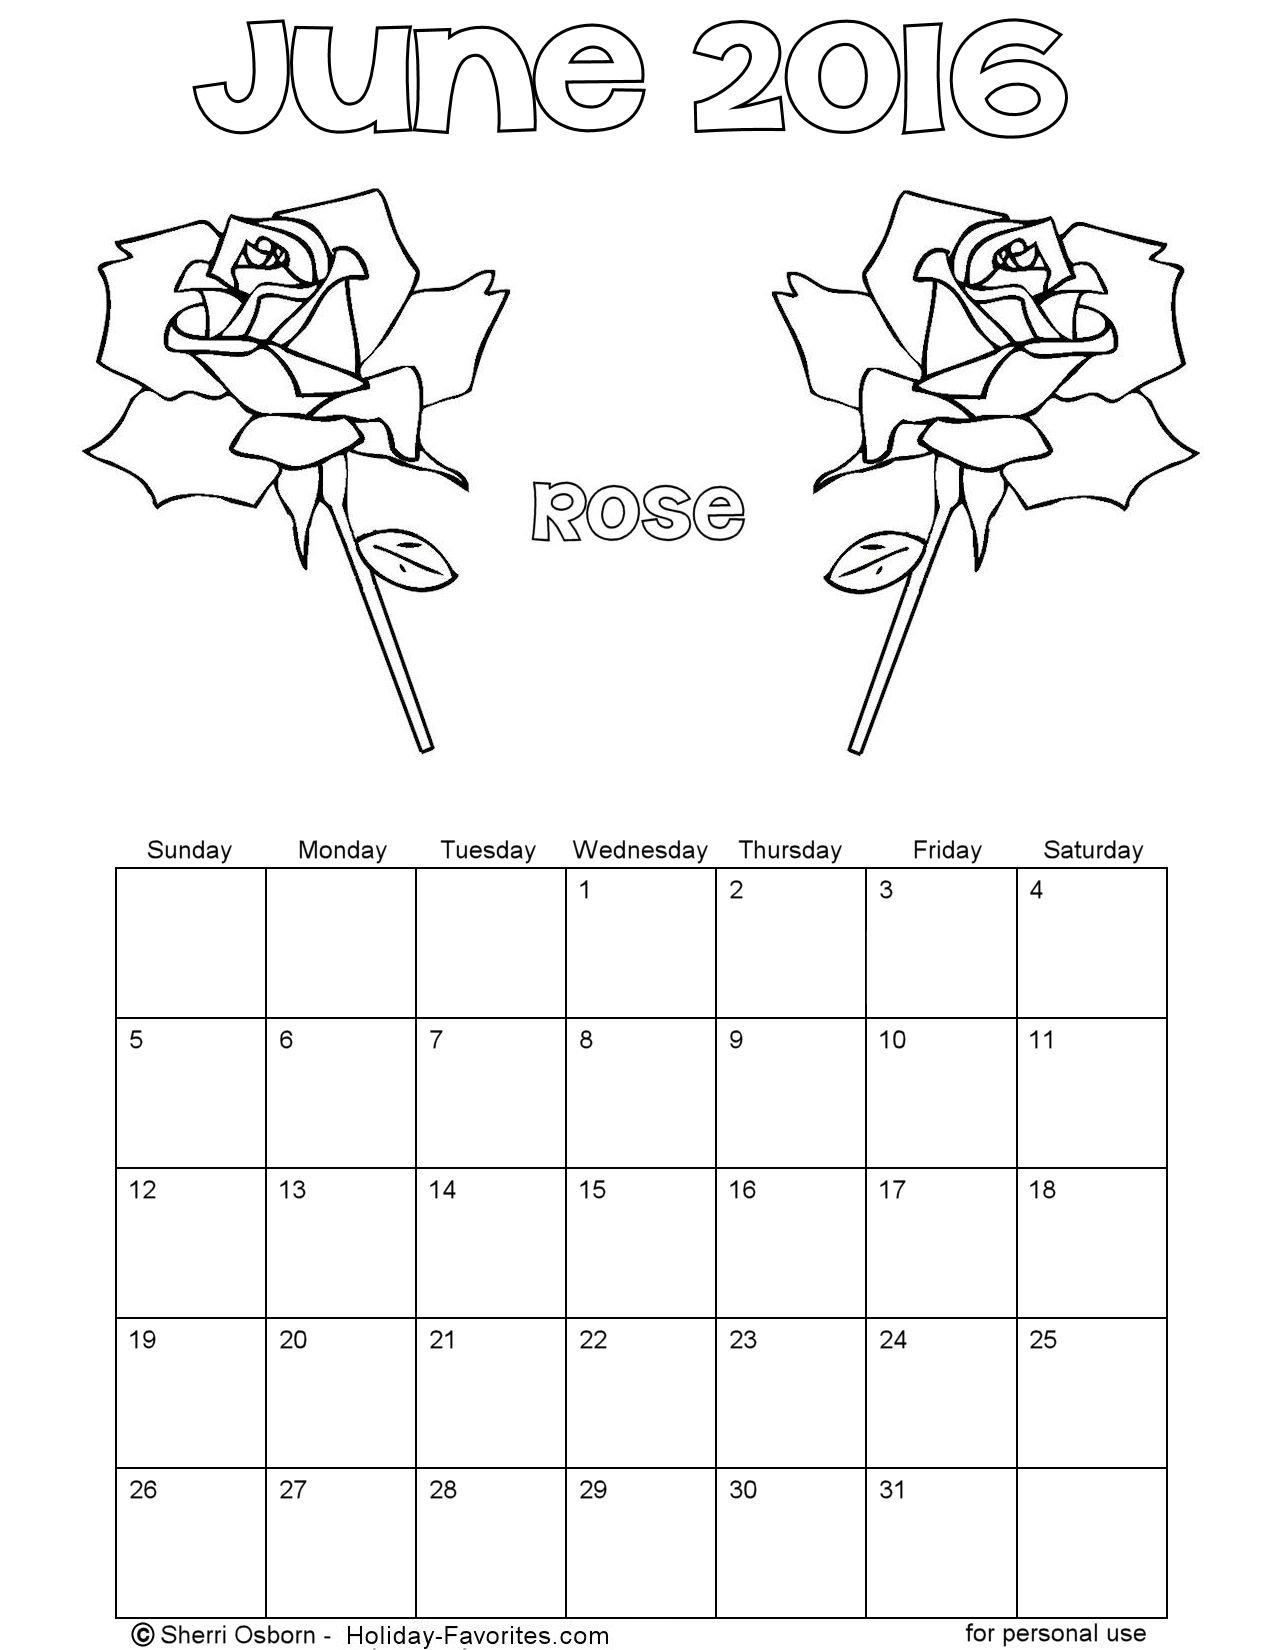 Printable June 2016 Calendars | Holiday Favorites